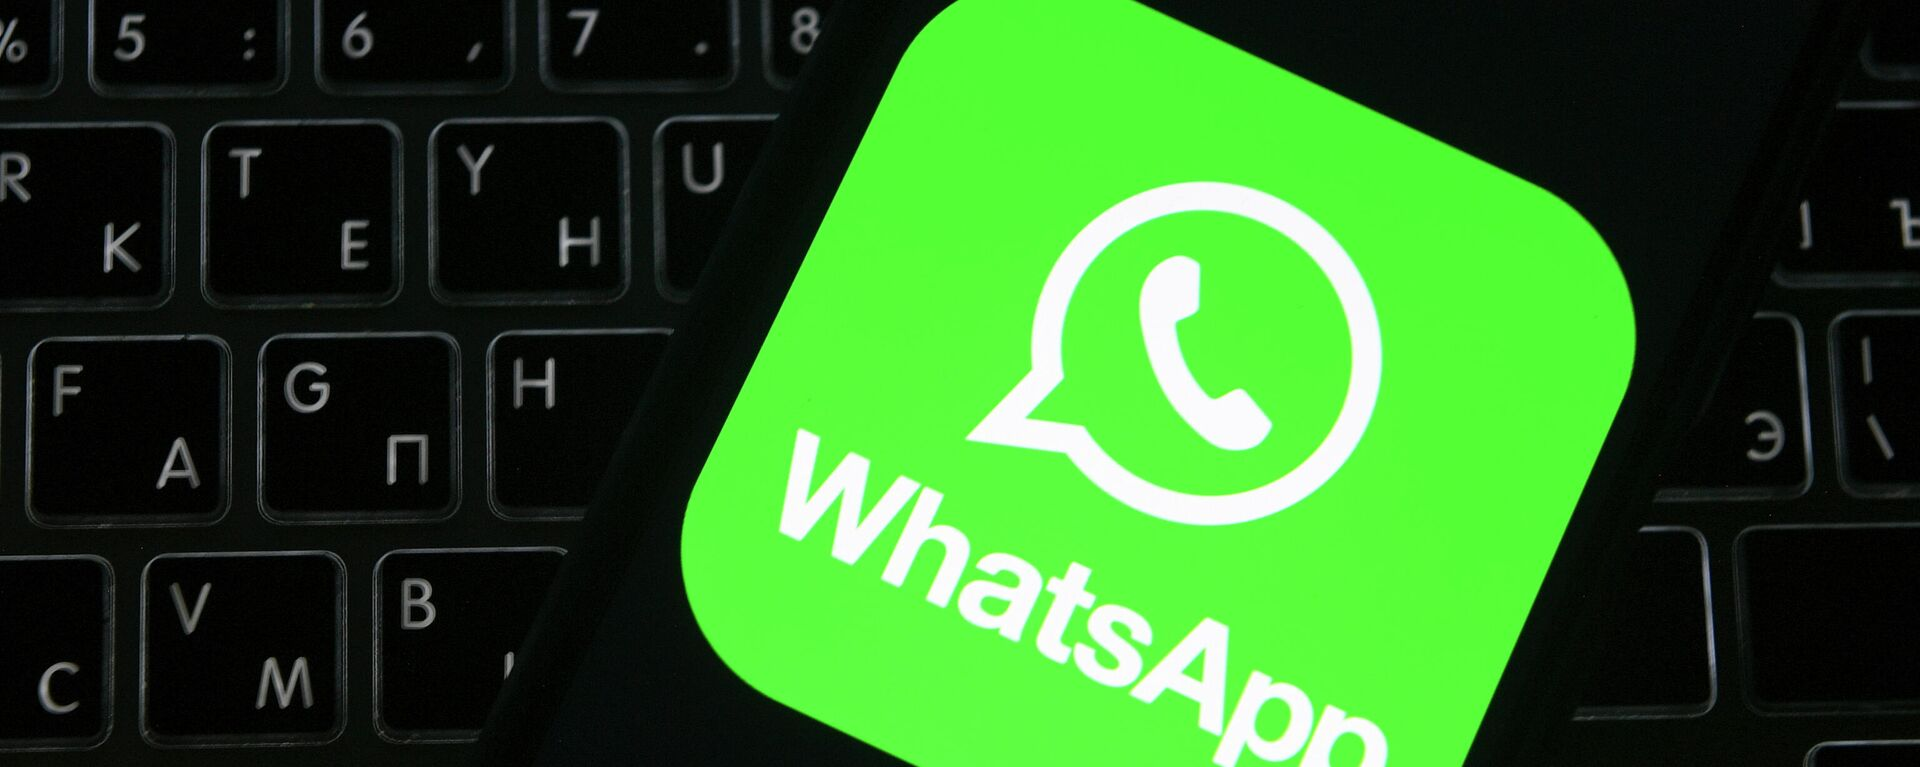 WhatsApp-Logo (Symbolbild) - SNA, 1920, 02.09.2021